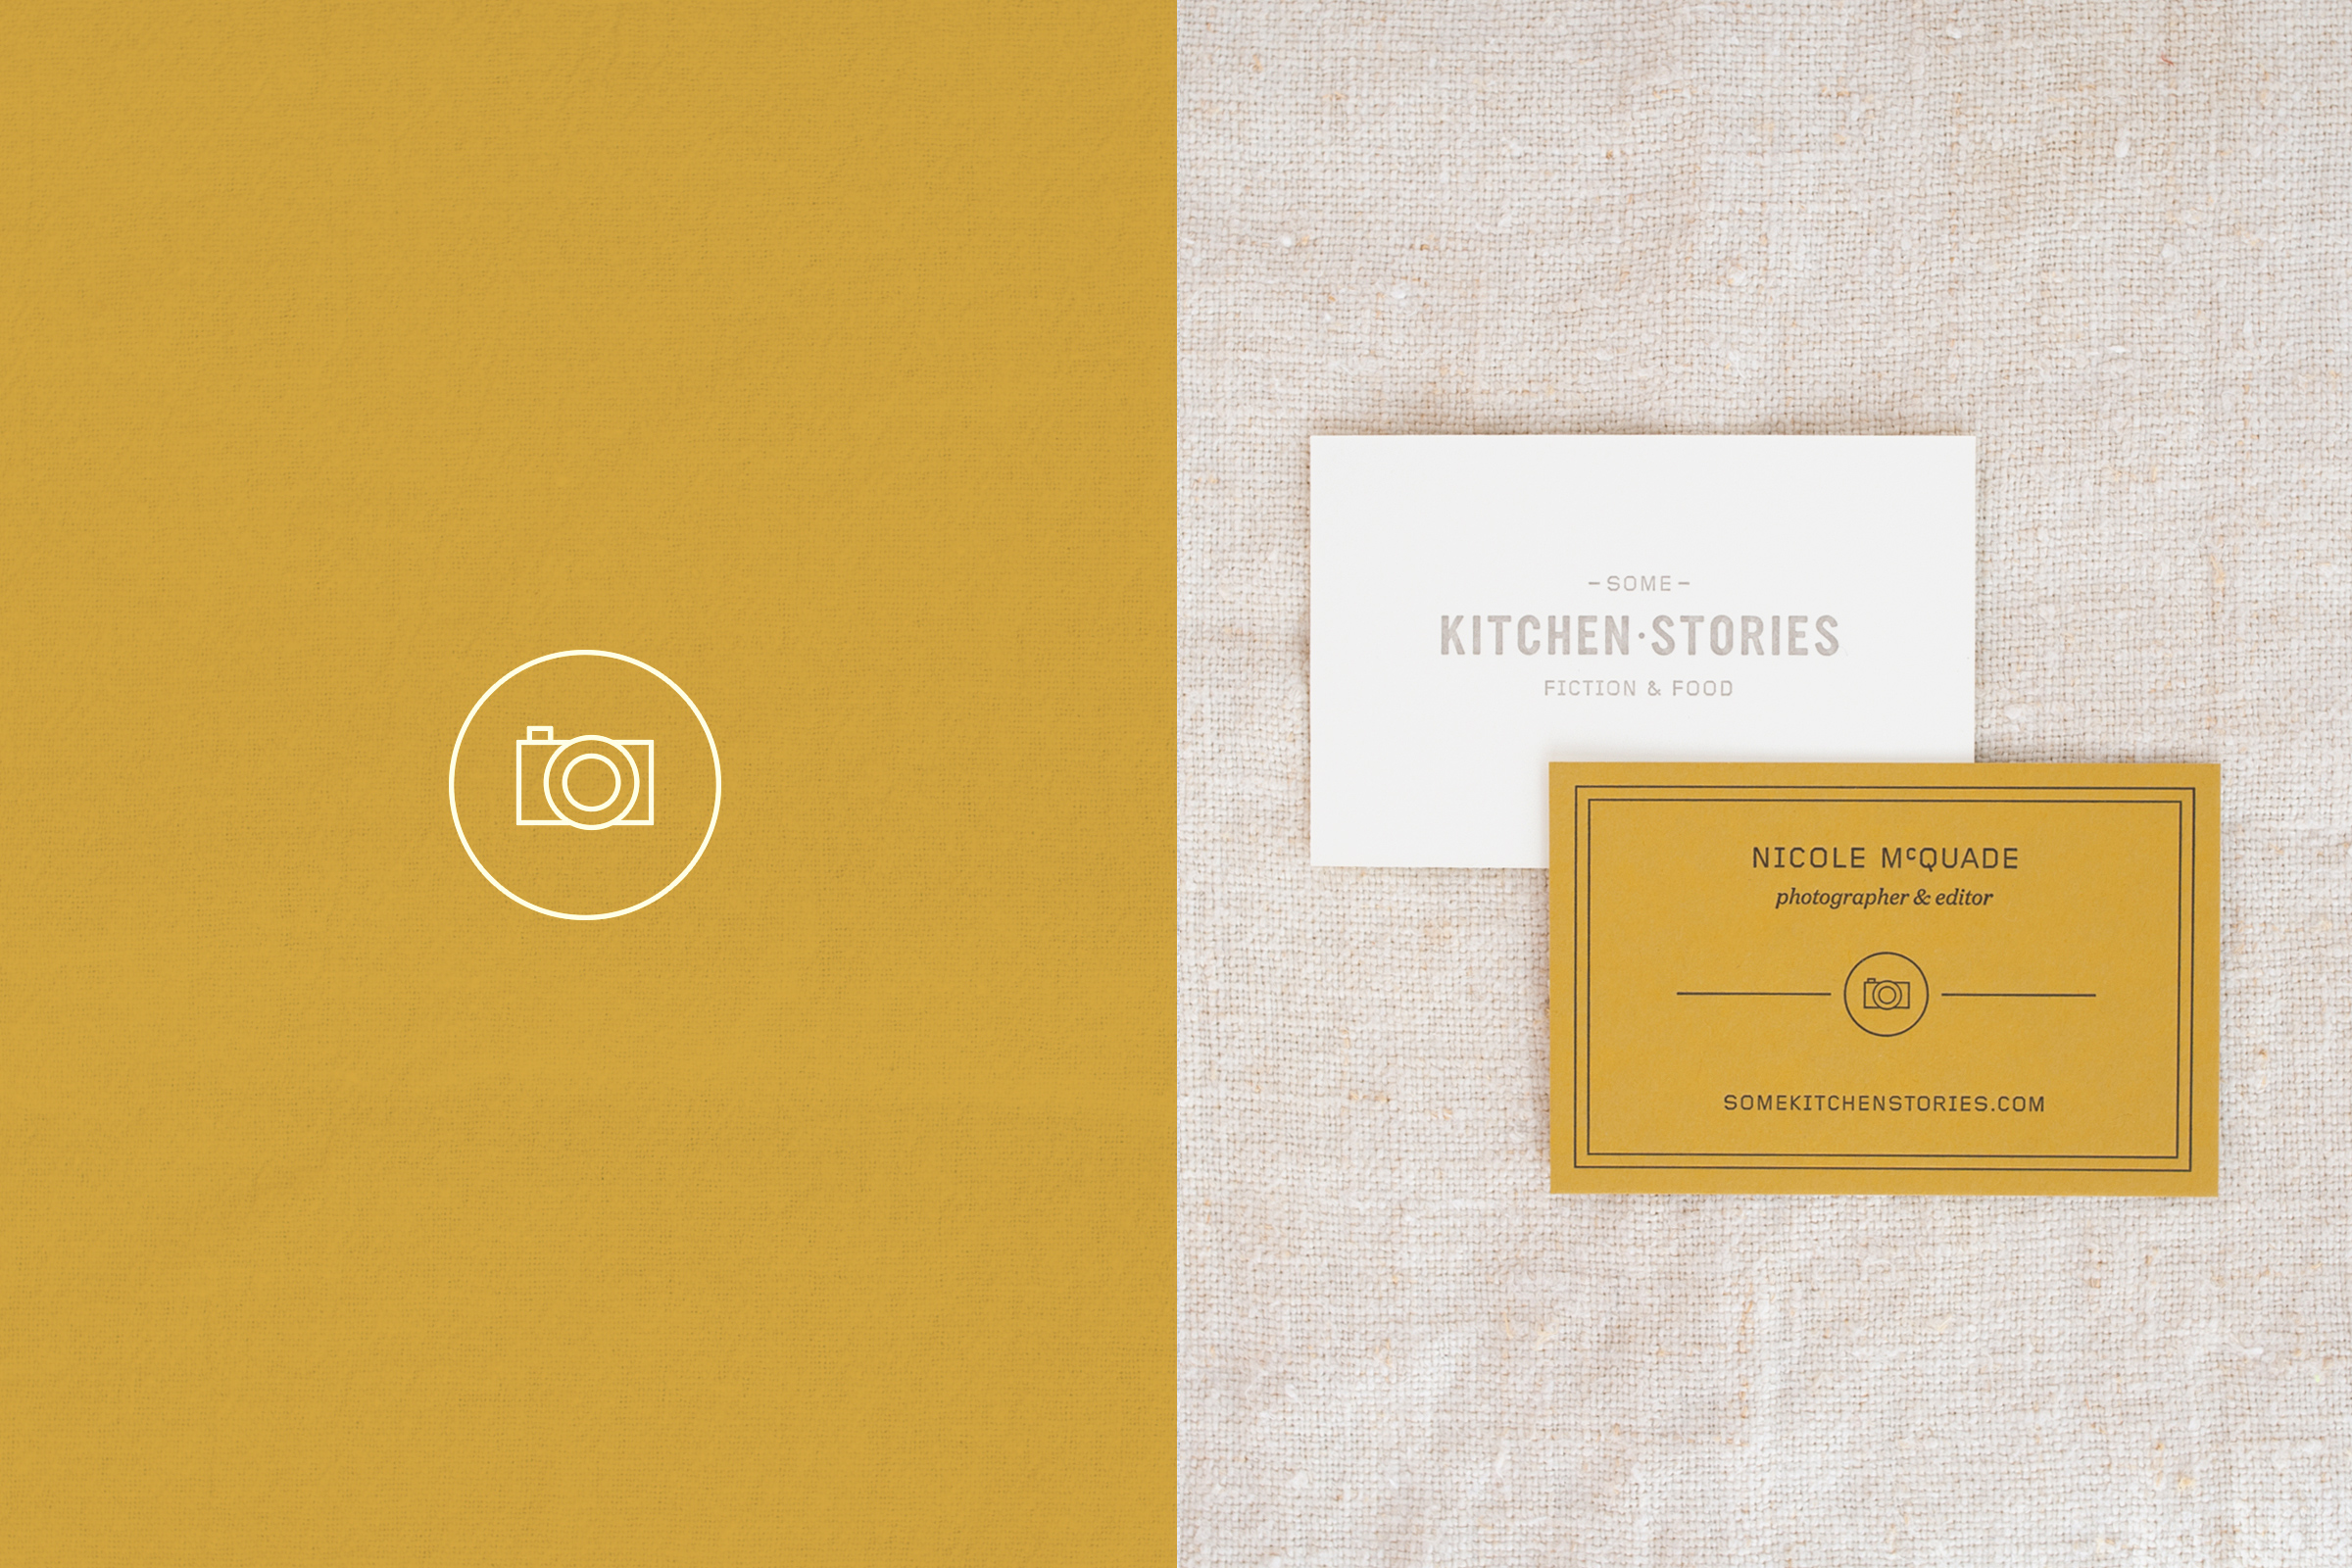 SomeKitchenStories_Branding_3.jpg